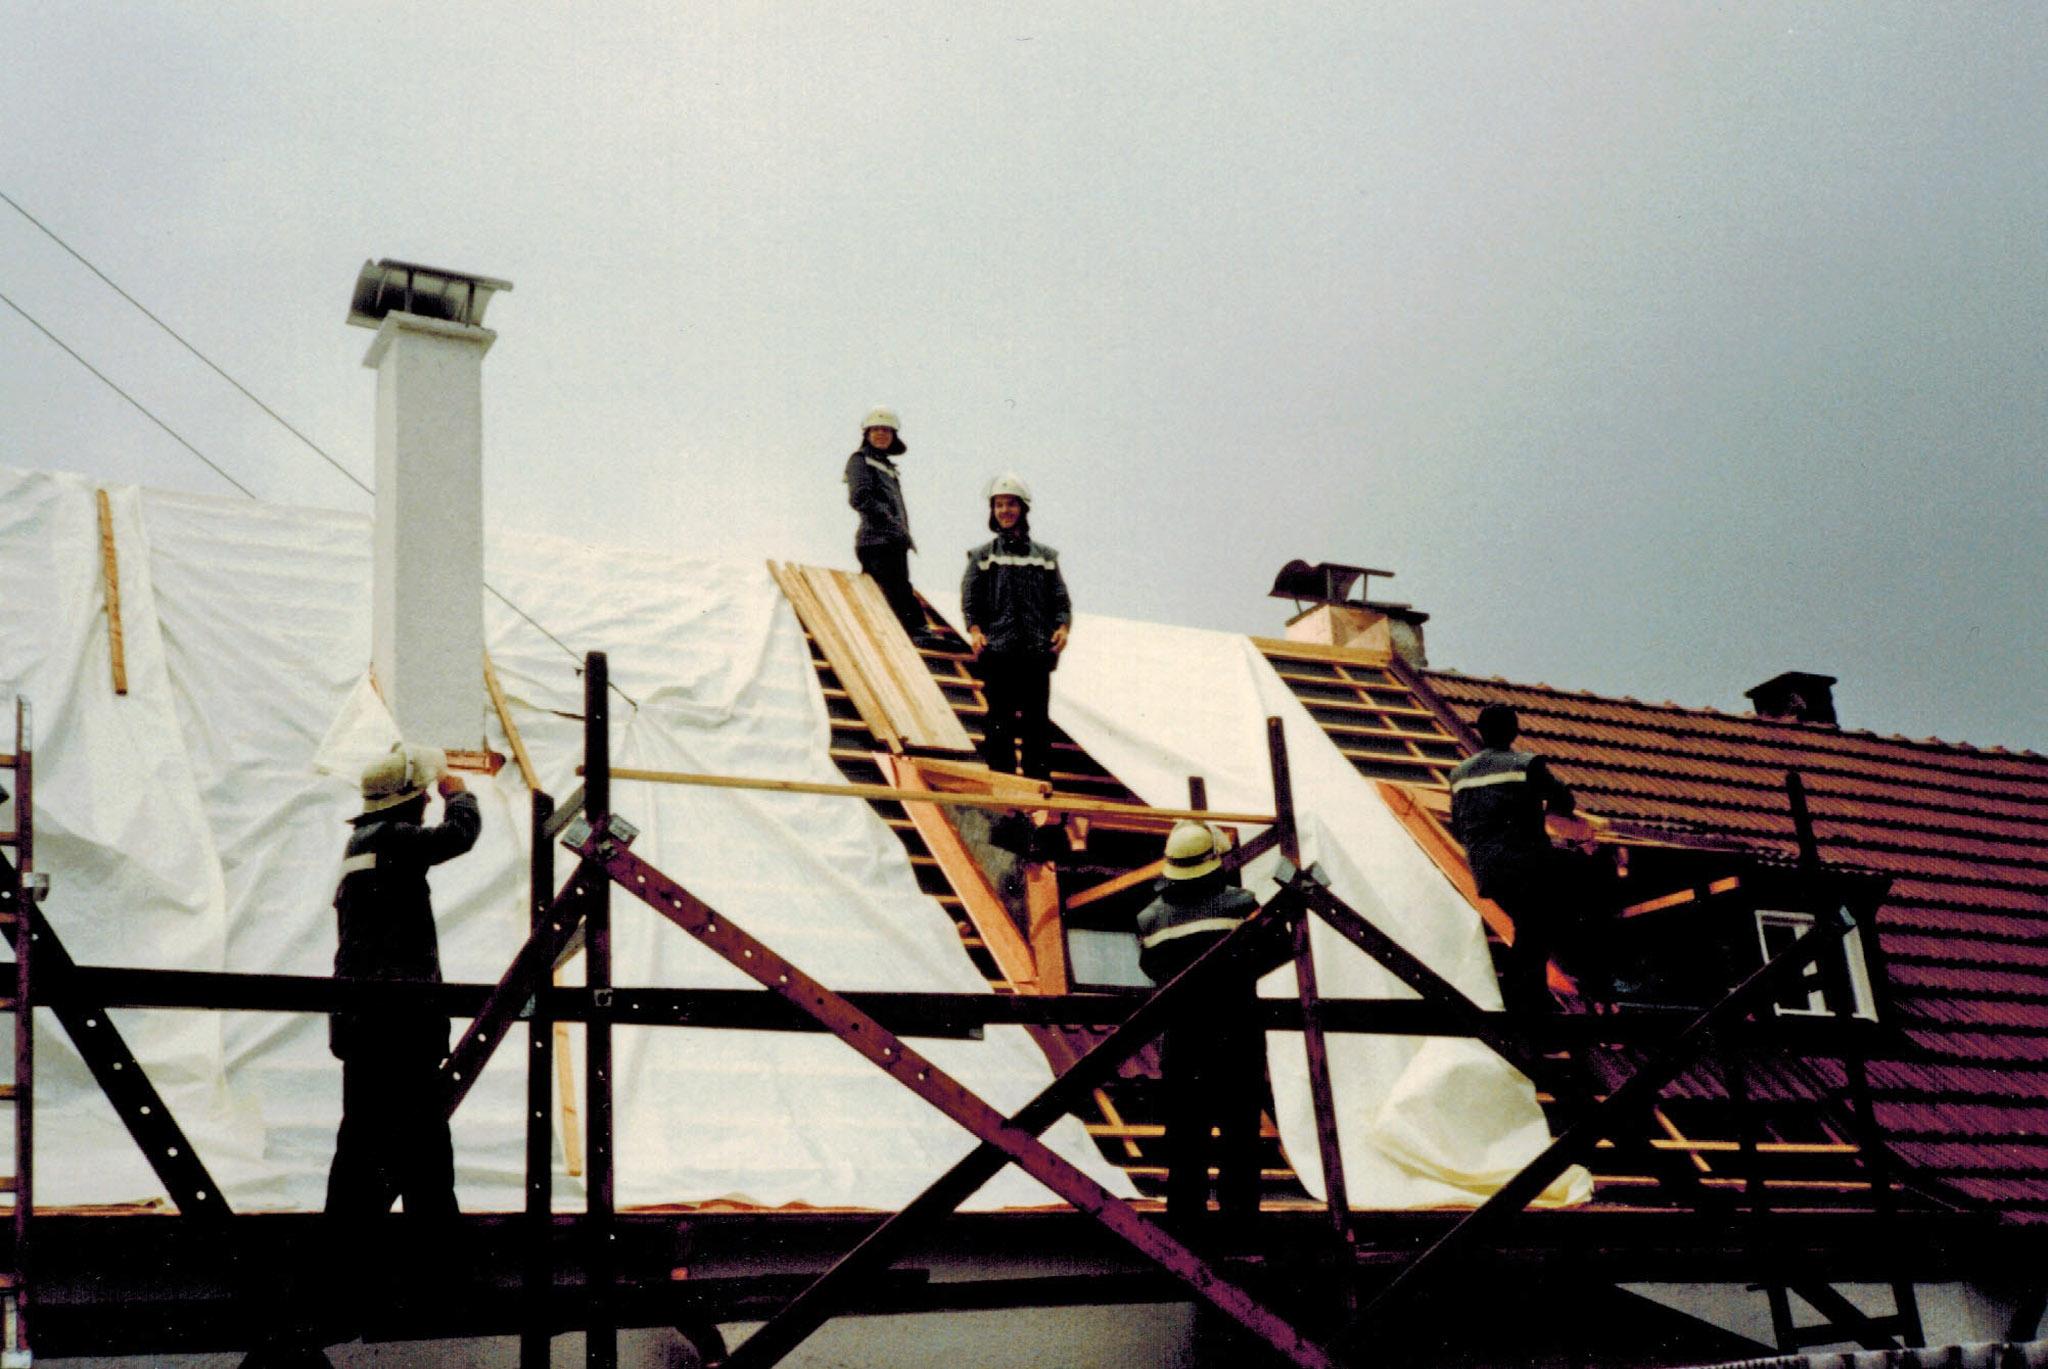 Hagelsturm München